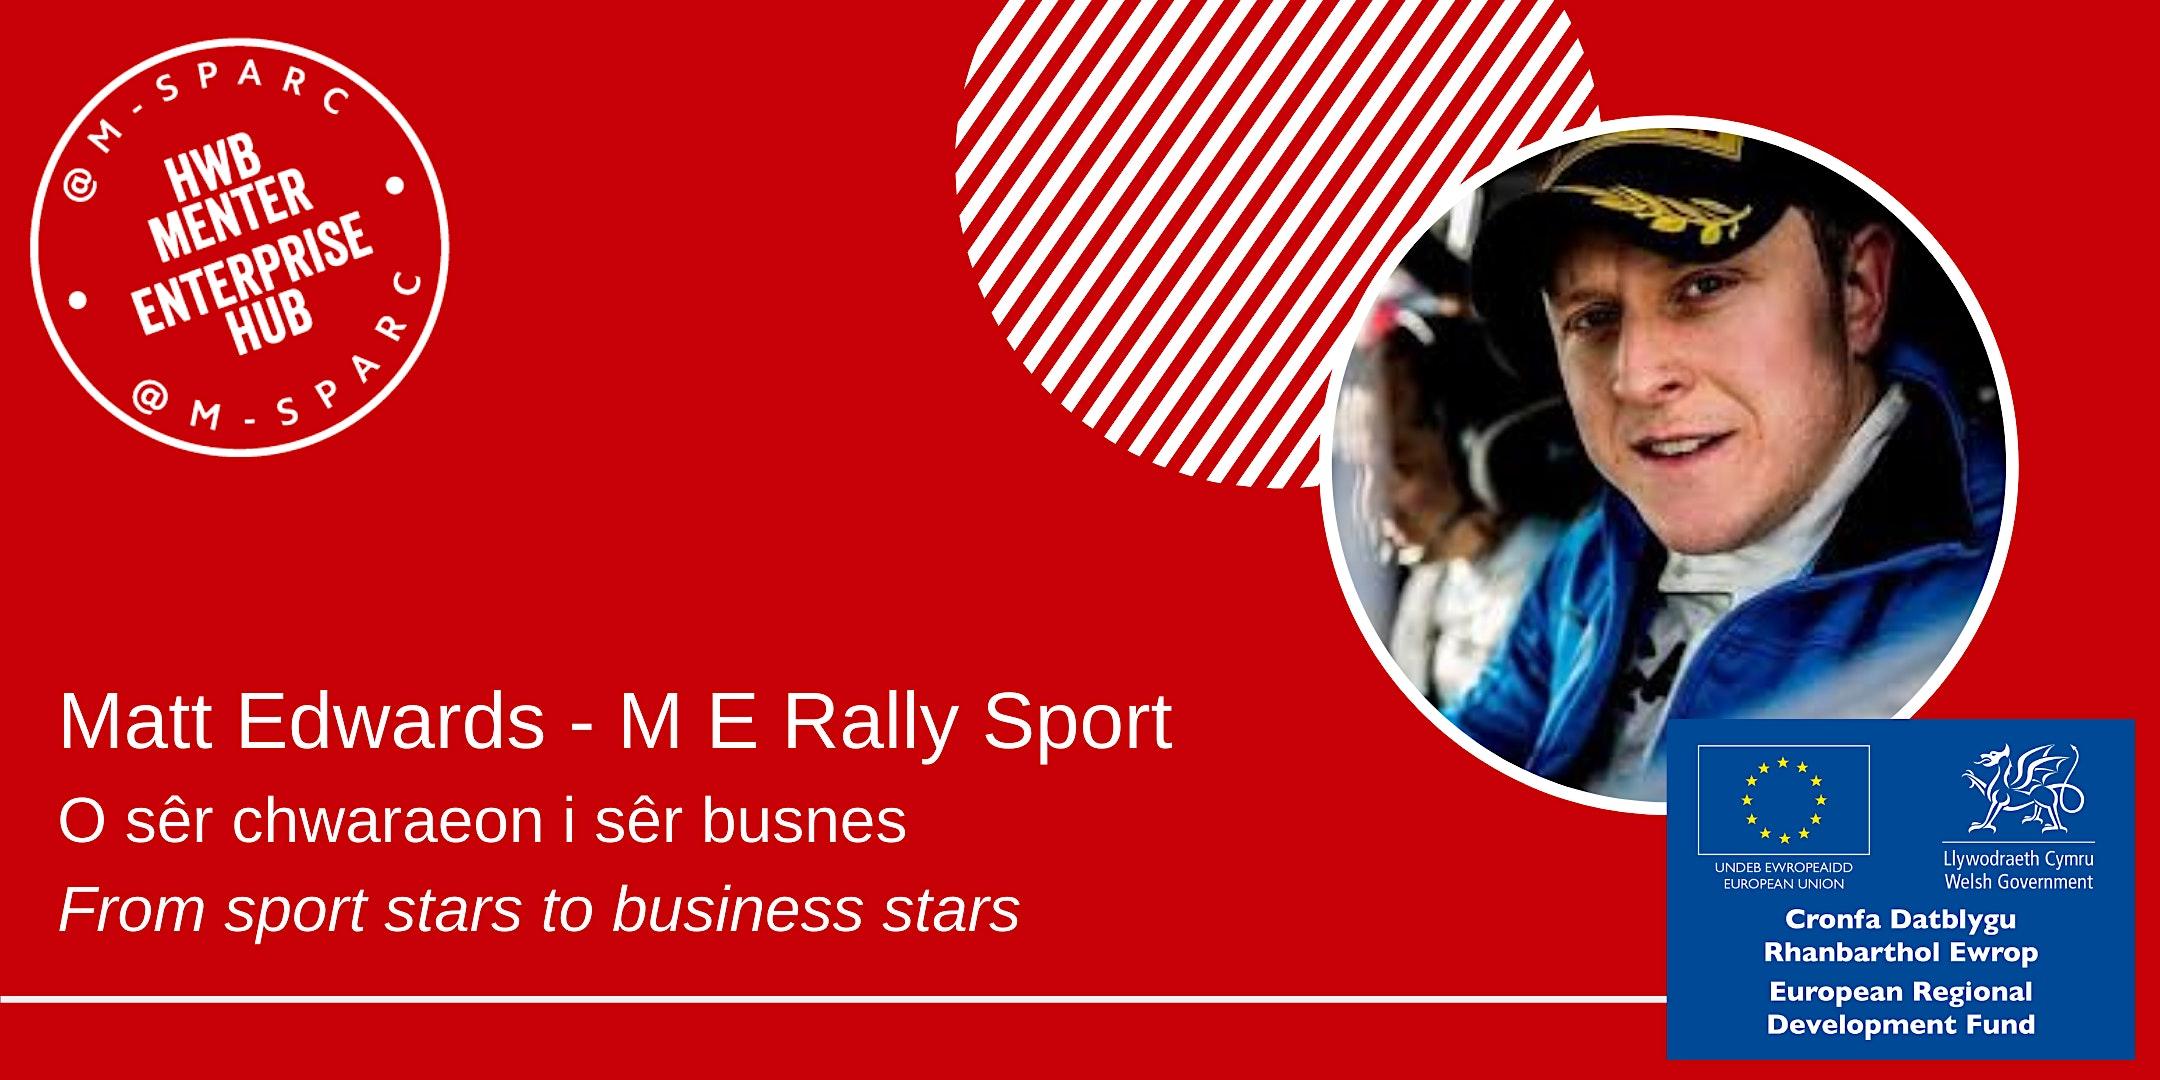 Matt Edwards - O sêr chwaraeon i busnes... from sport stars to business...